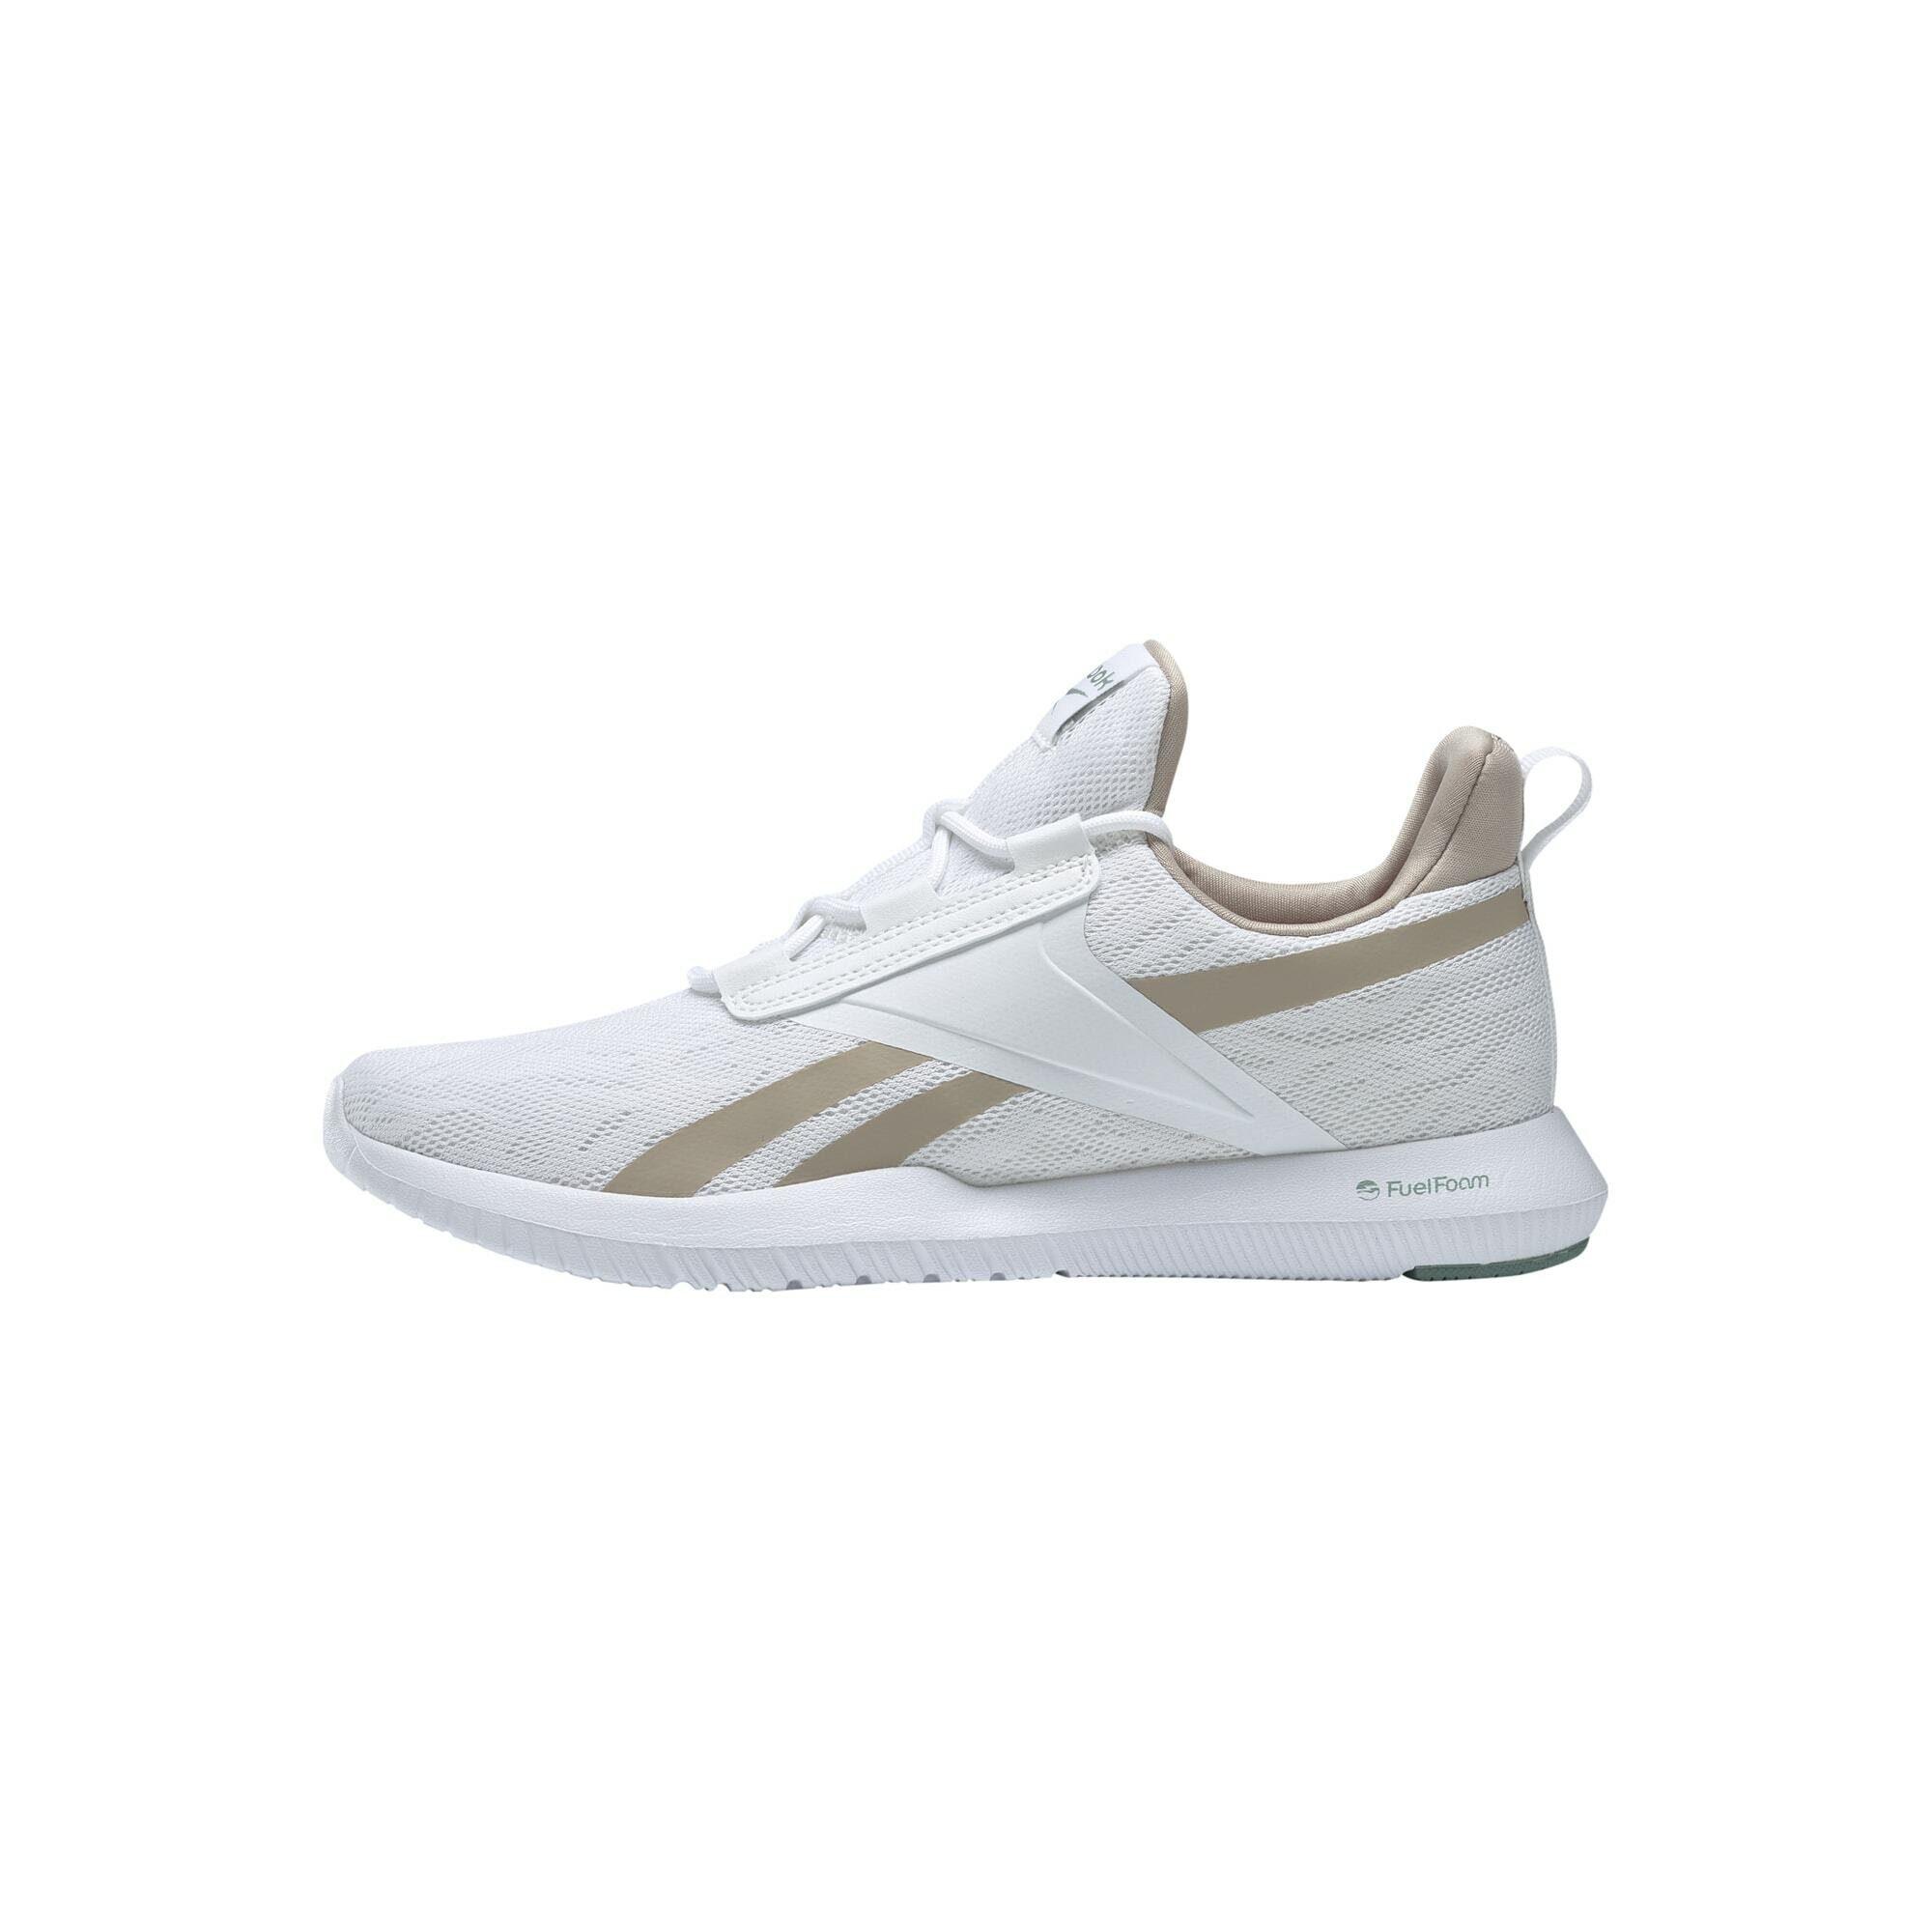 Reebok »Reebok Reago Pulse 2.0 Shoes« Trainingsschuh online kaufen | OTTO